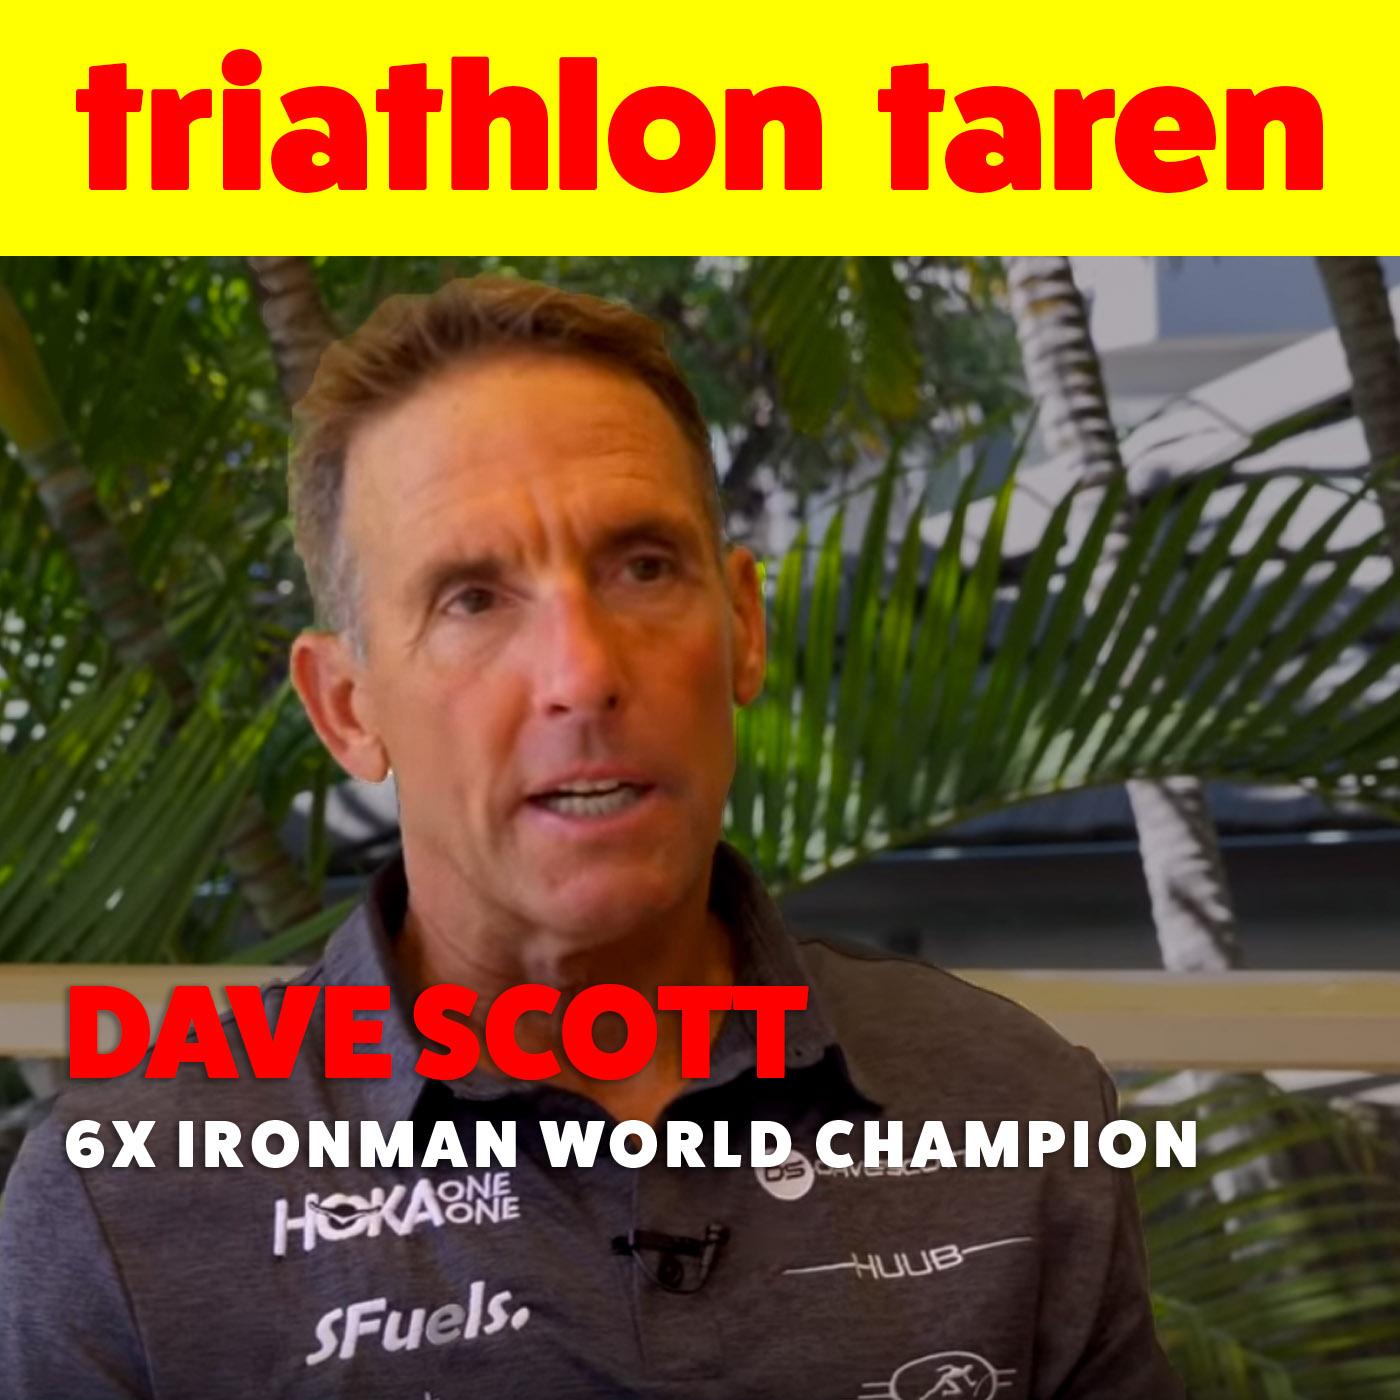 Even 6x Ironman World Champion Dave Scott Struggles With Motivation